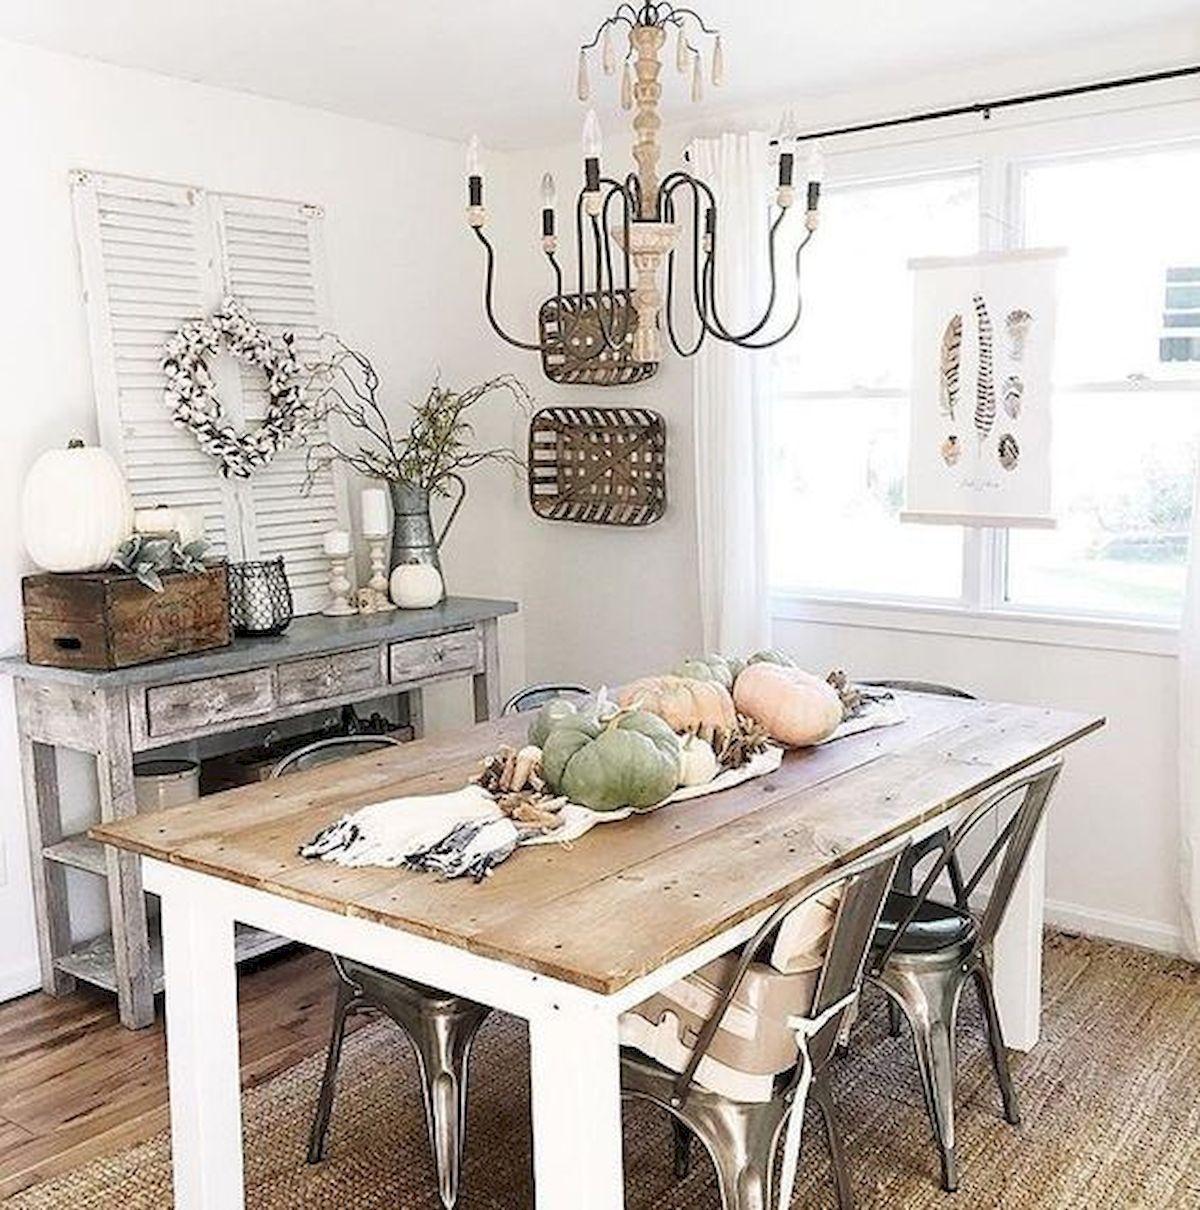 20 Bedroom Chandelier Designs Decorating Ideas: 20 The Best Farmhouse Ladder Chandelier Design Ideas (11